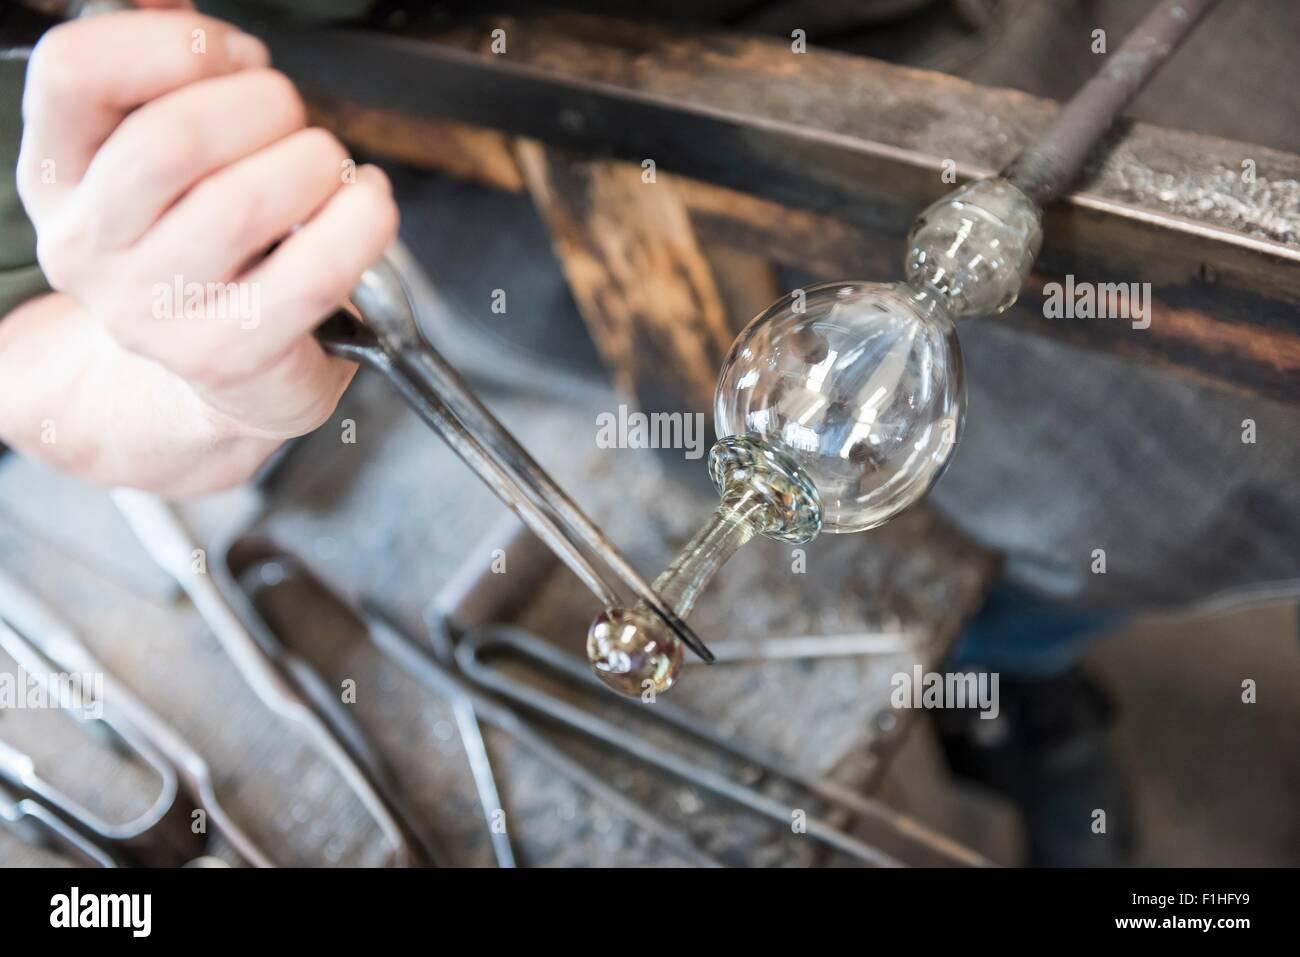 Formando Glassblower objeto de cristal caliente, cerrar Imagen De Stock